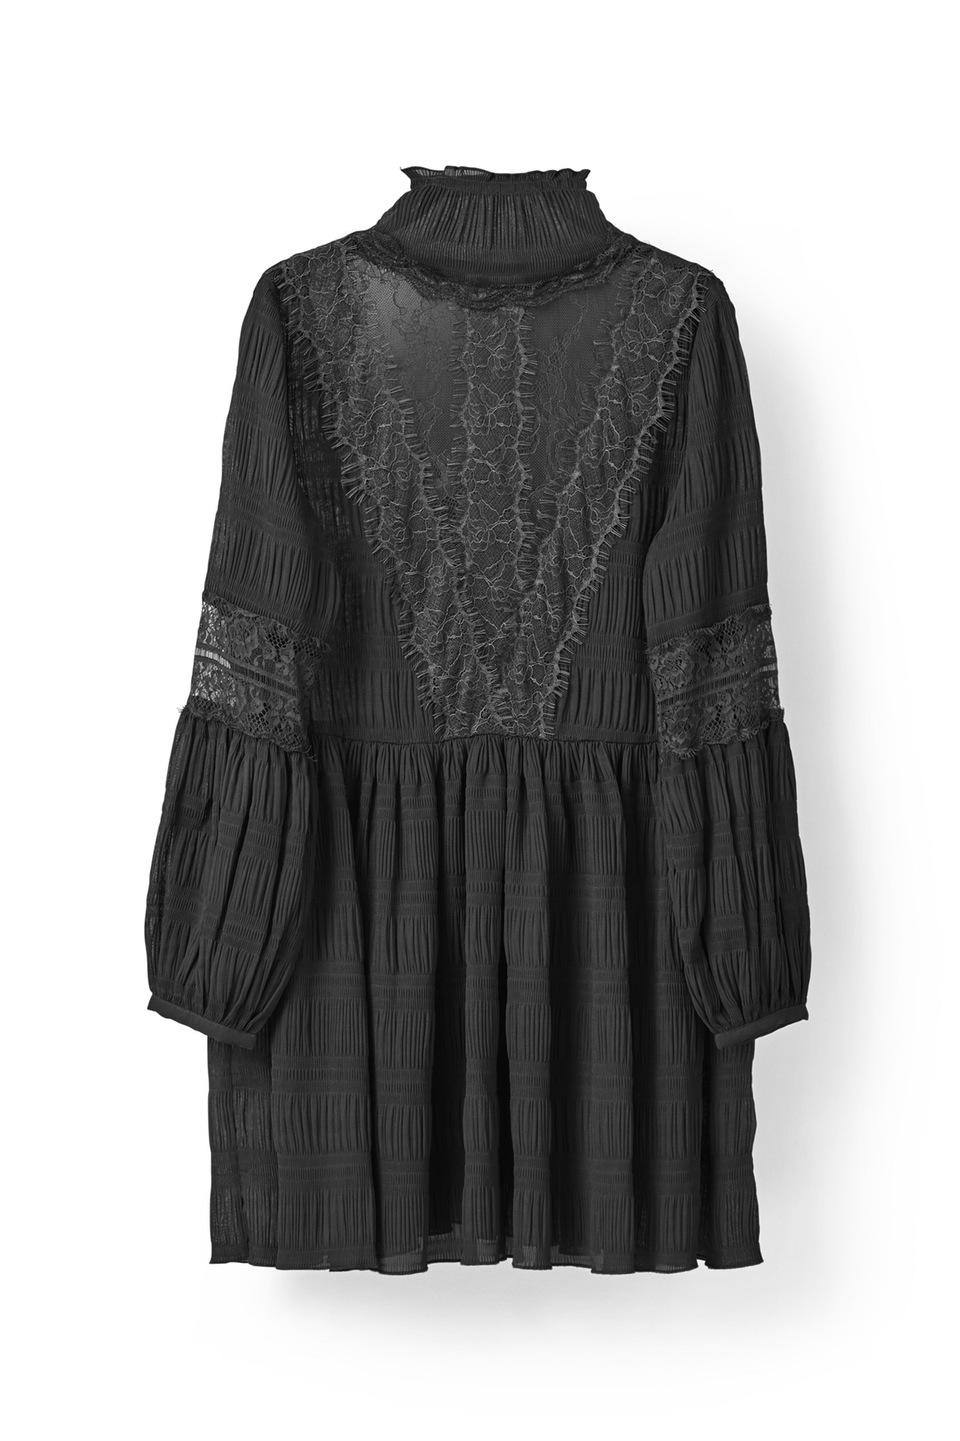 McKinney Pleat Dress 179 евро ganni.com